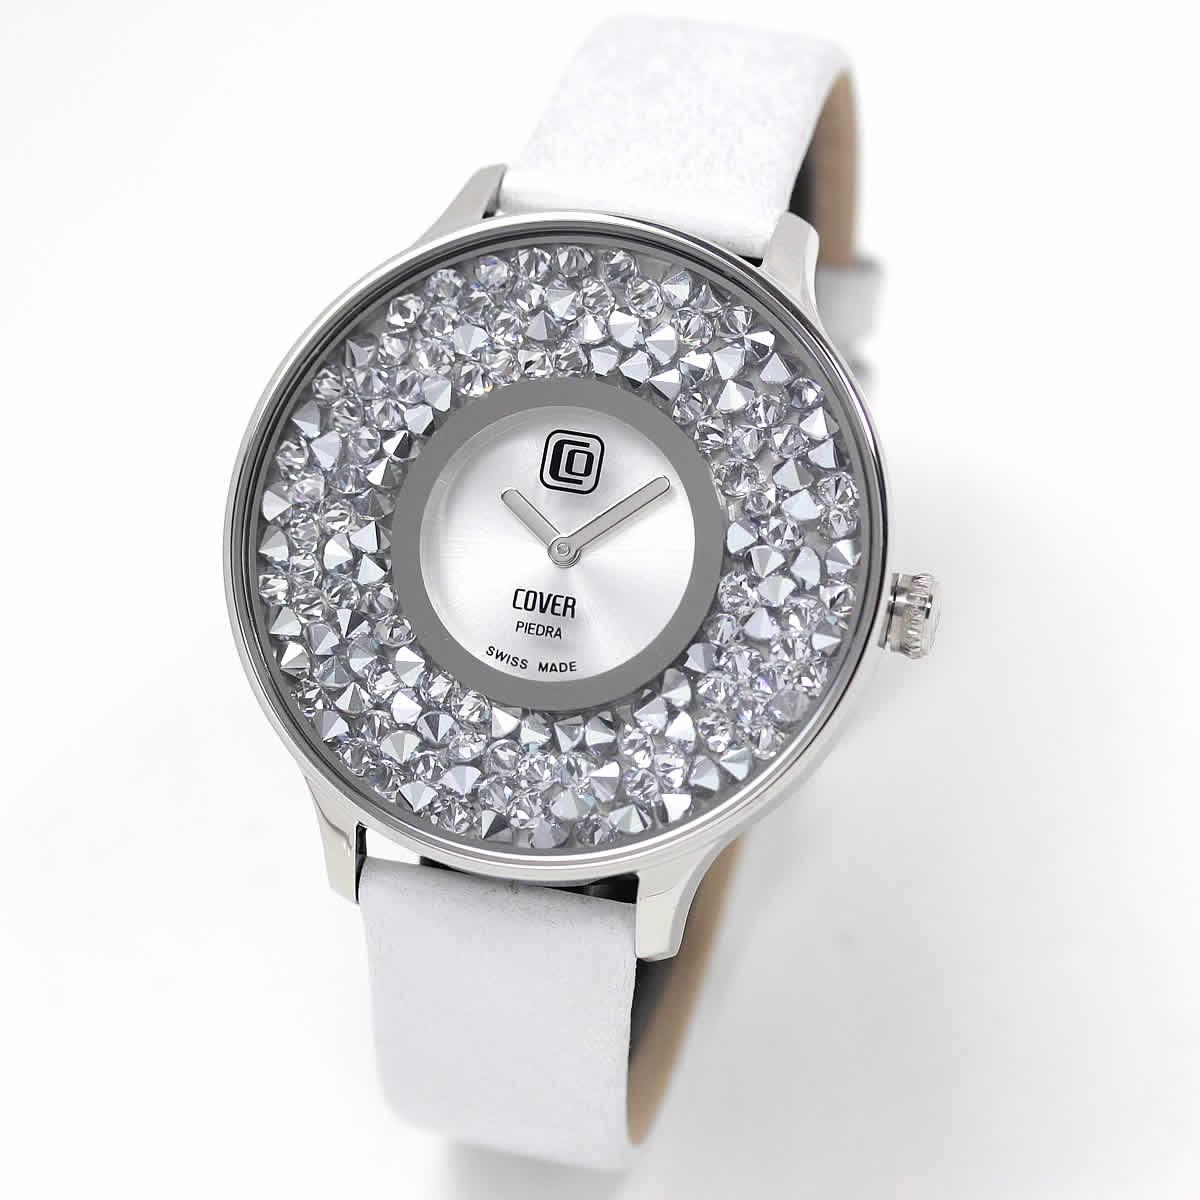 COVER(コヴァー) TREND PIEDRA Co158.01 ホワイト 女性用腕時計